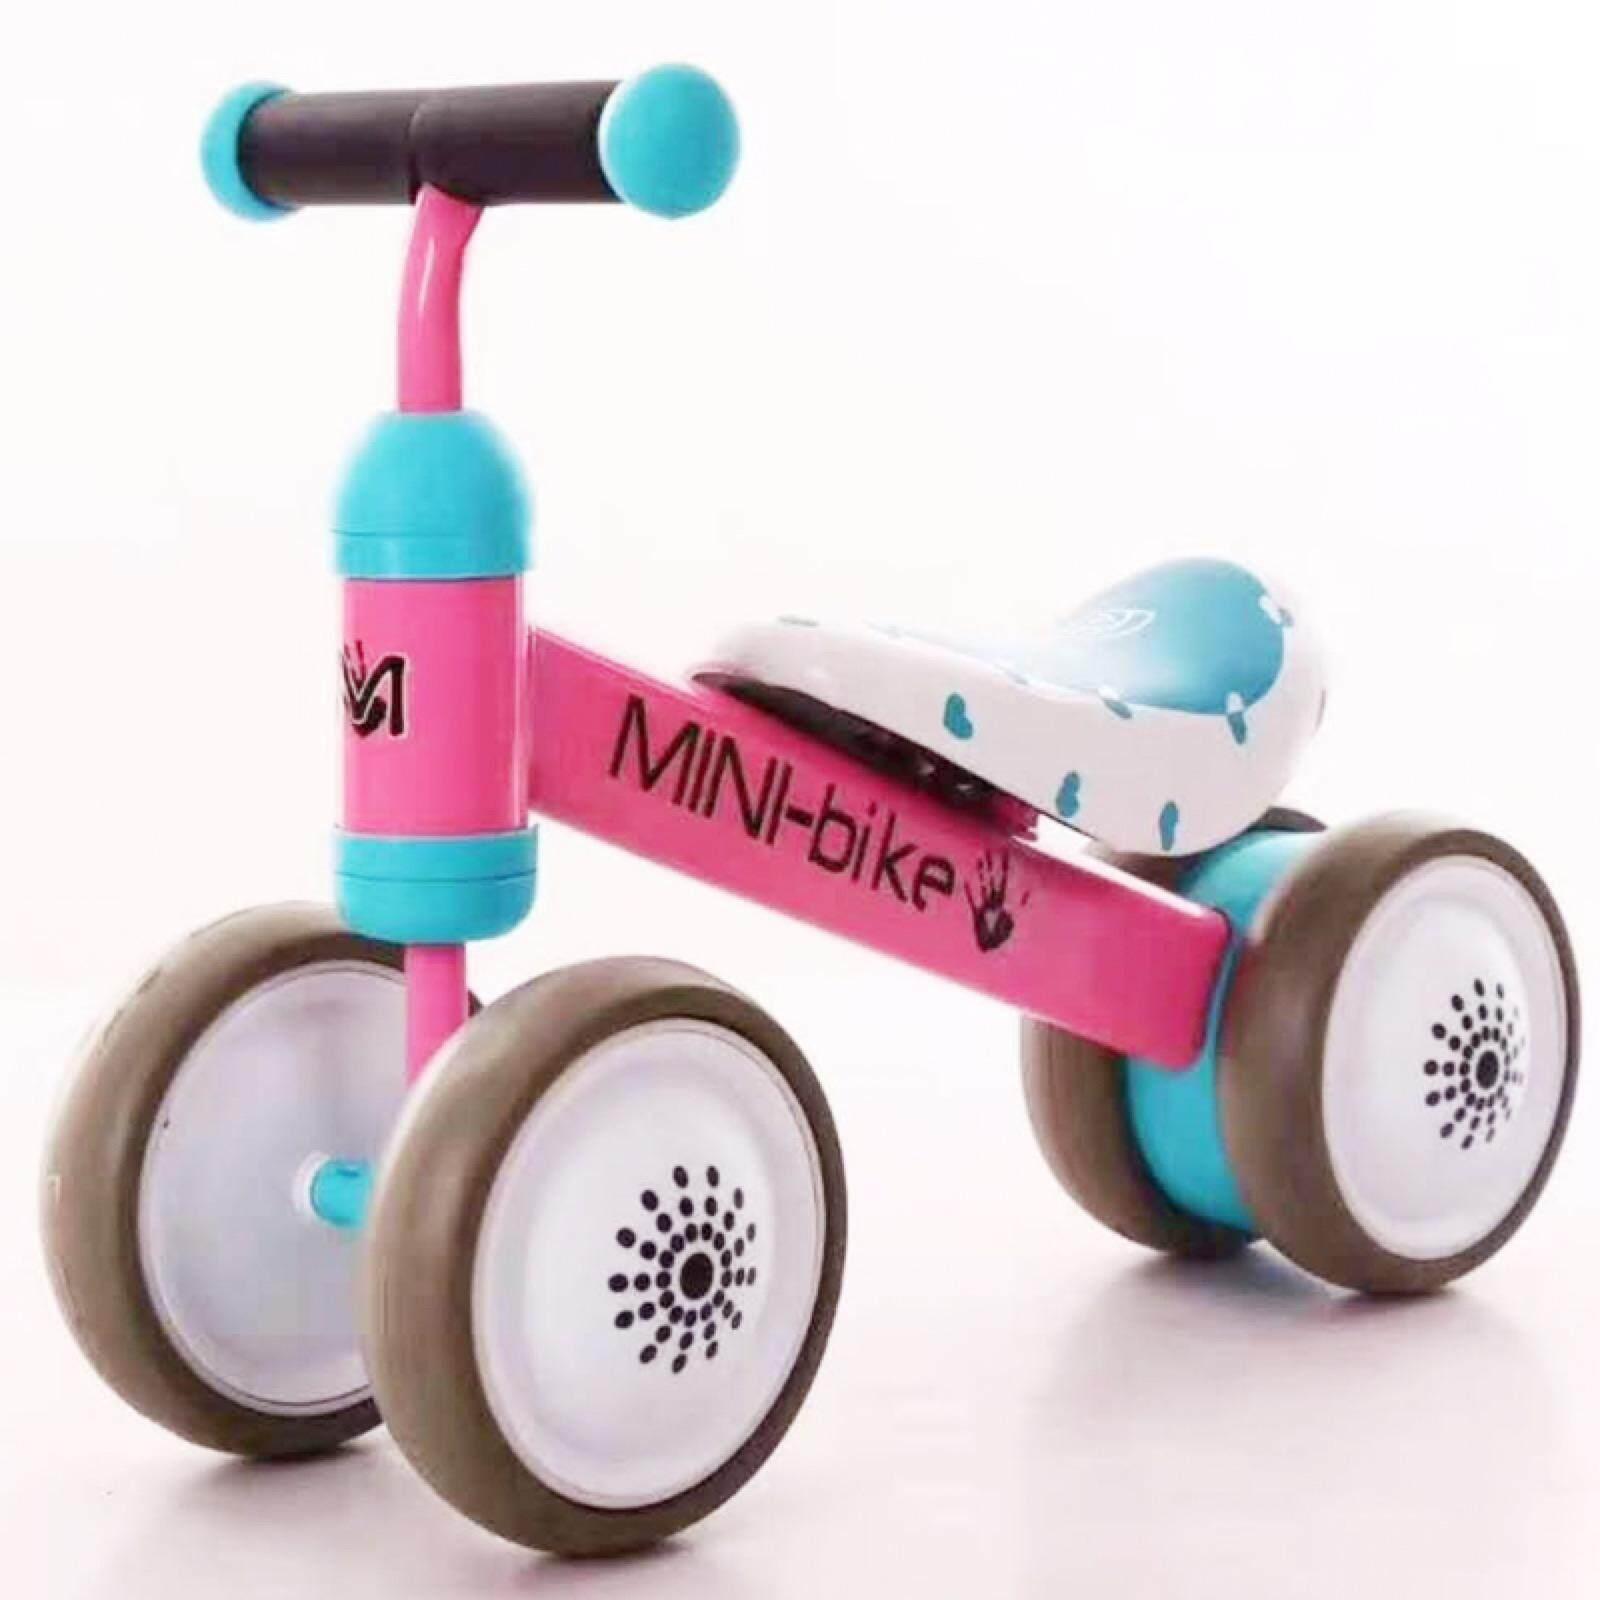 B.B KARE จักรยานทรงตัว จักรยานขาไถ จักรยานเด็ก จักรยานฝึกการทรงตัว รถจักรยานทรงตัวเด็ก รถทรงตัว รถขาไถ สี่ล้อ Free Shipping